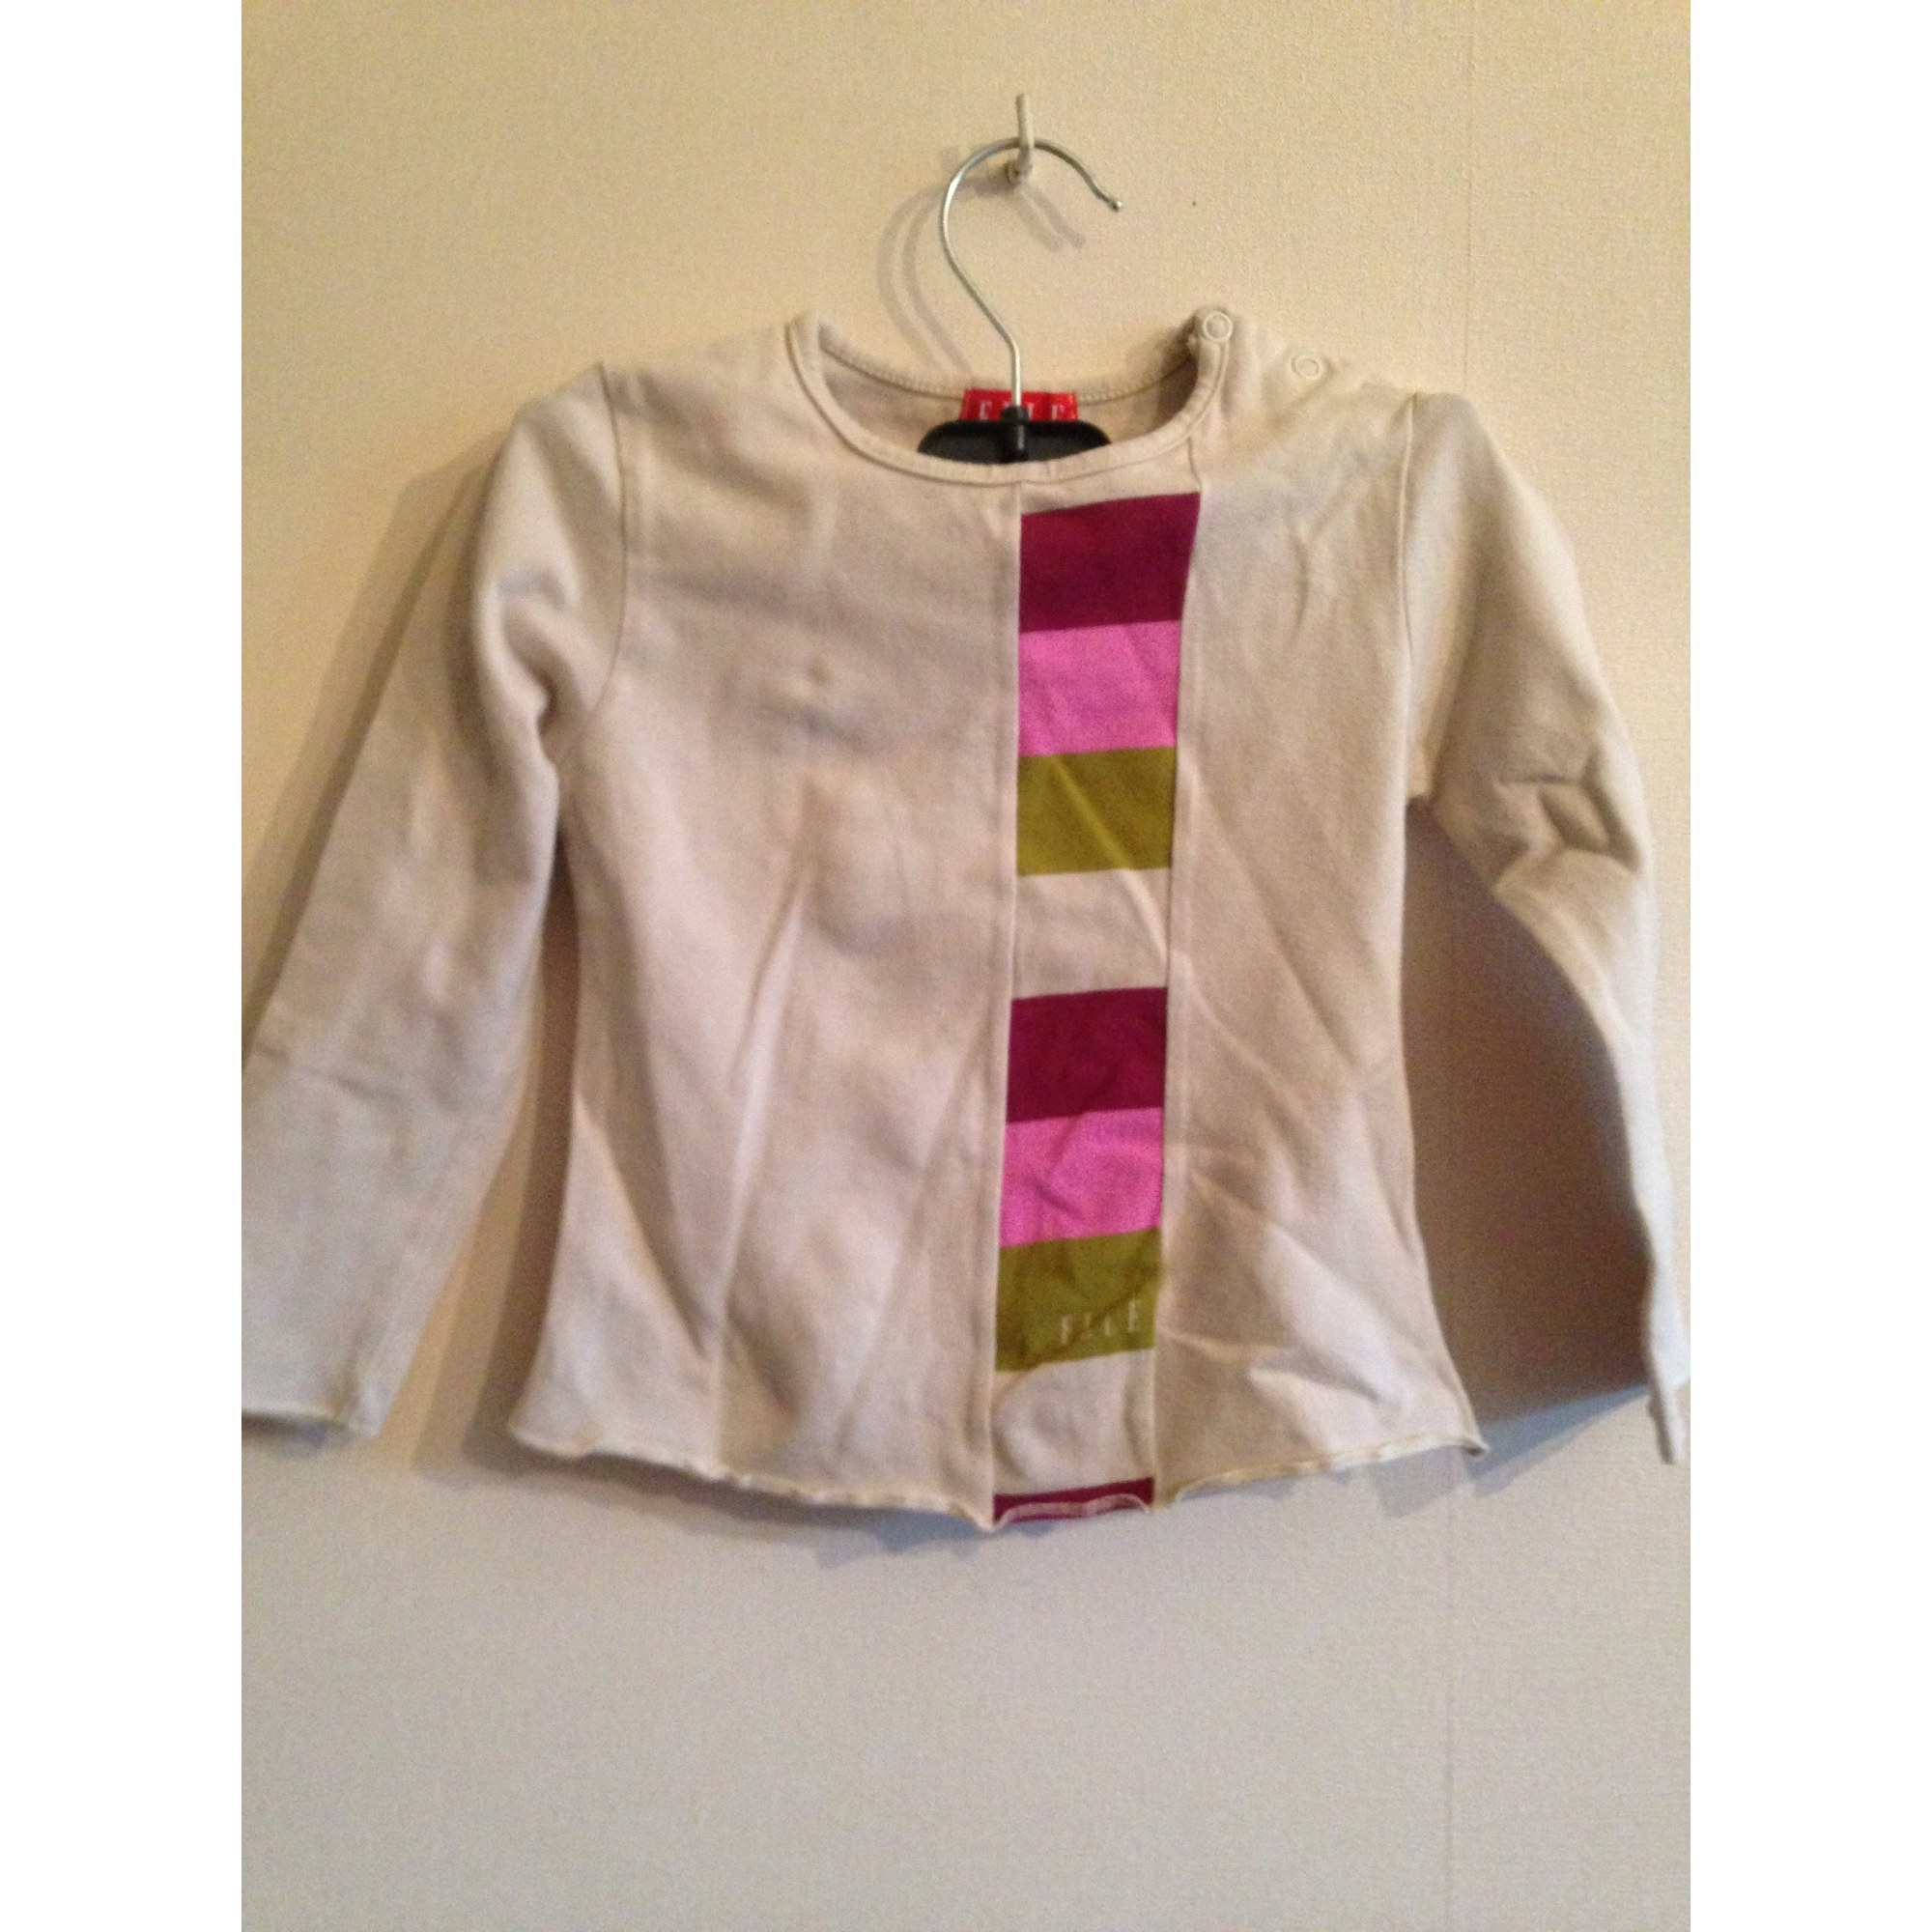 Top, Tee-shirt ELLE Beige, camel